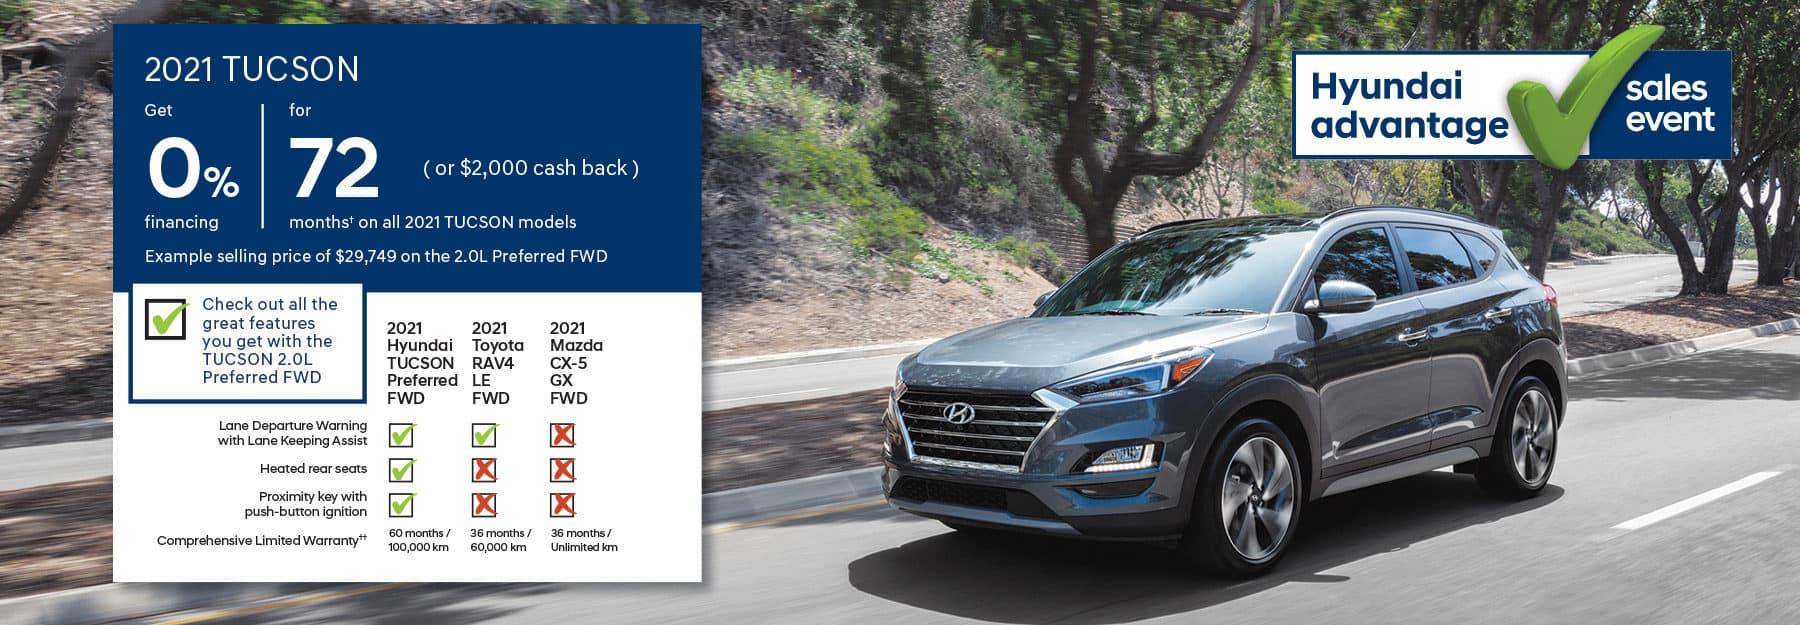 2021 Hyundai Tucson - Hyundai Advantage Sales Event